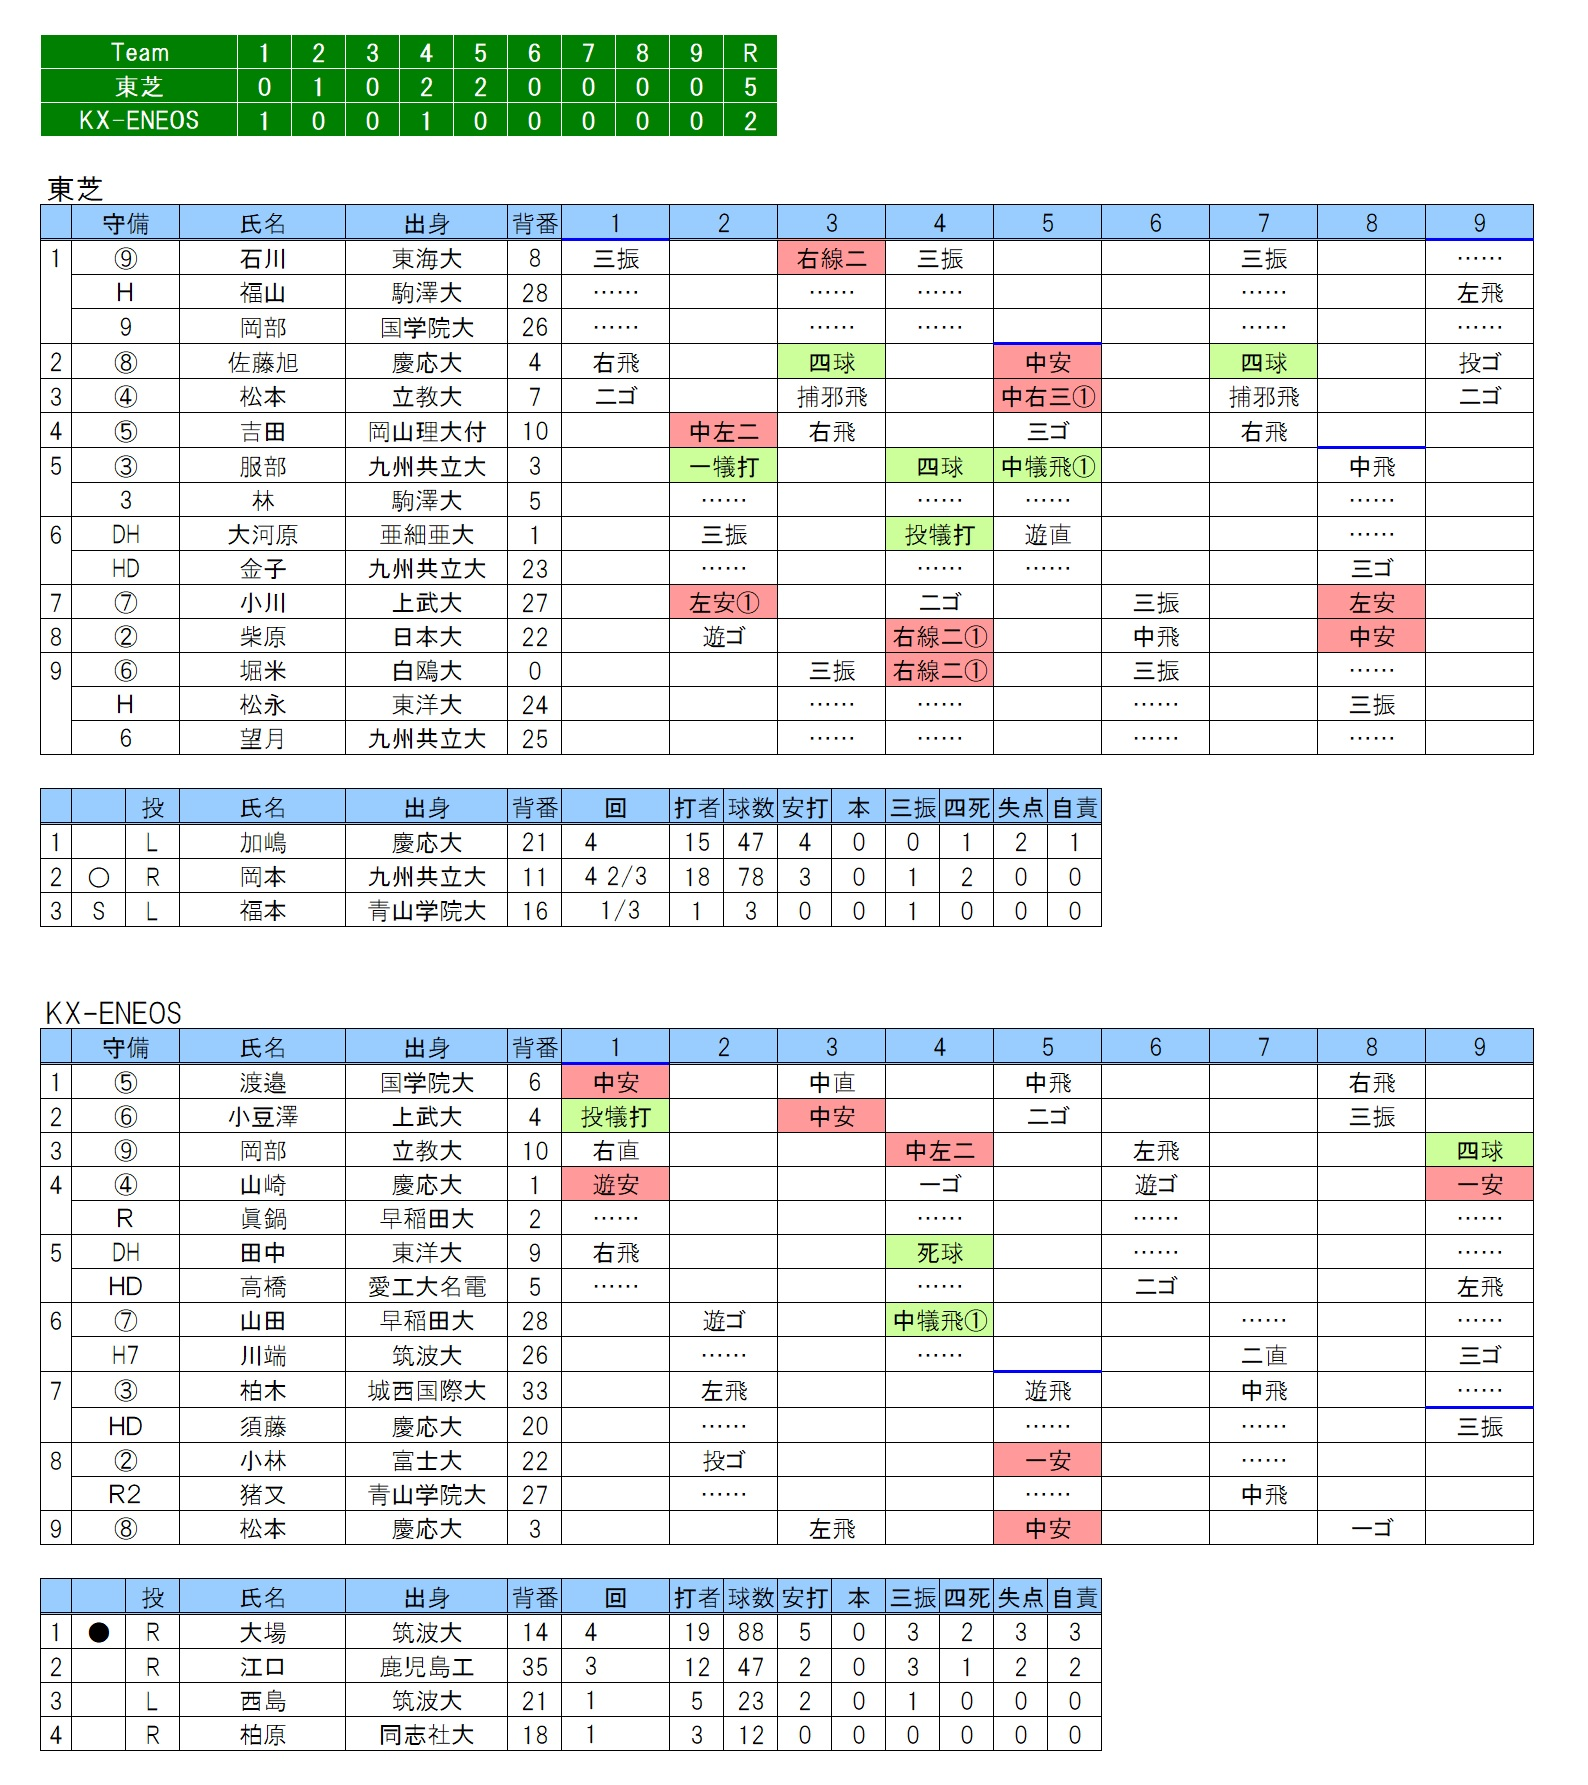 20180526東芝×JX-ENEOS